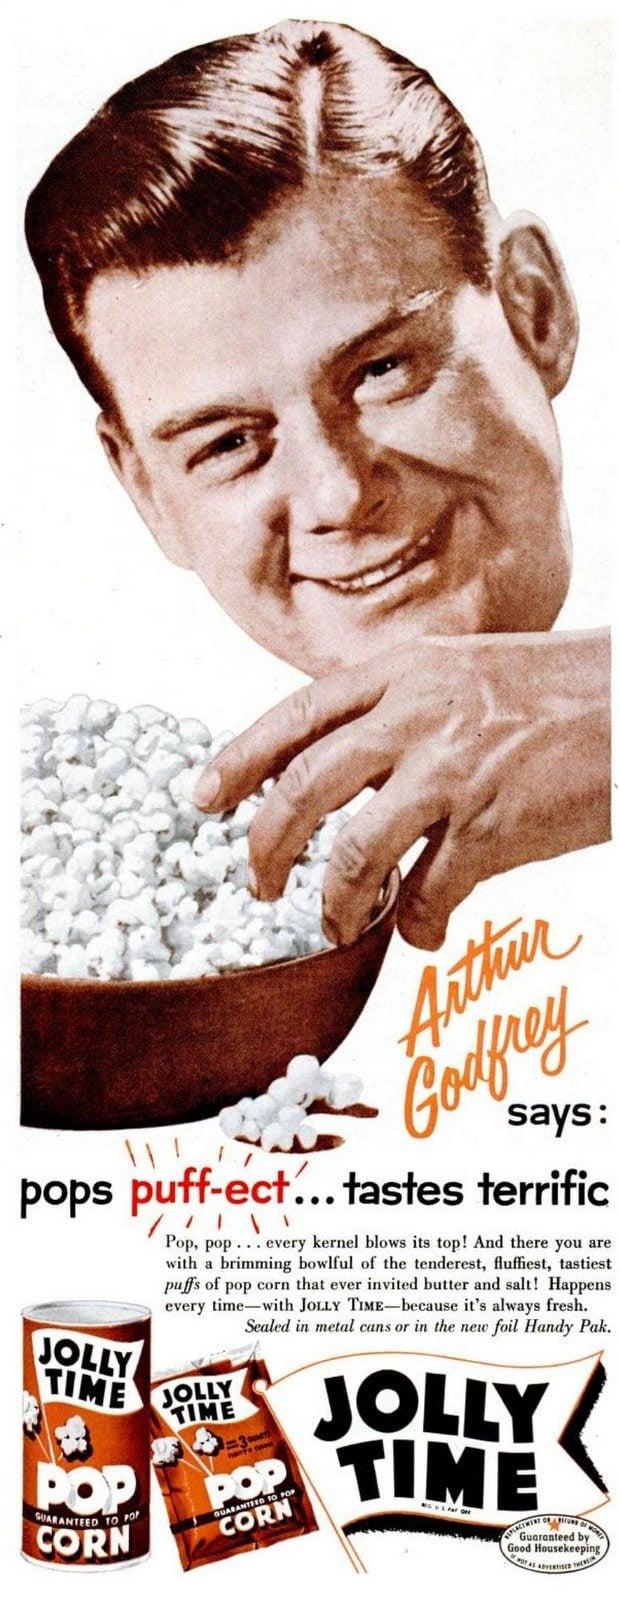 Arthur Godfrey for Jolly Time Pop Corn (1956)